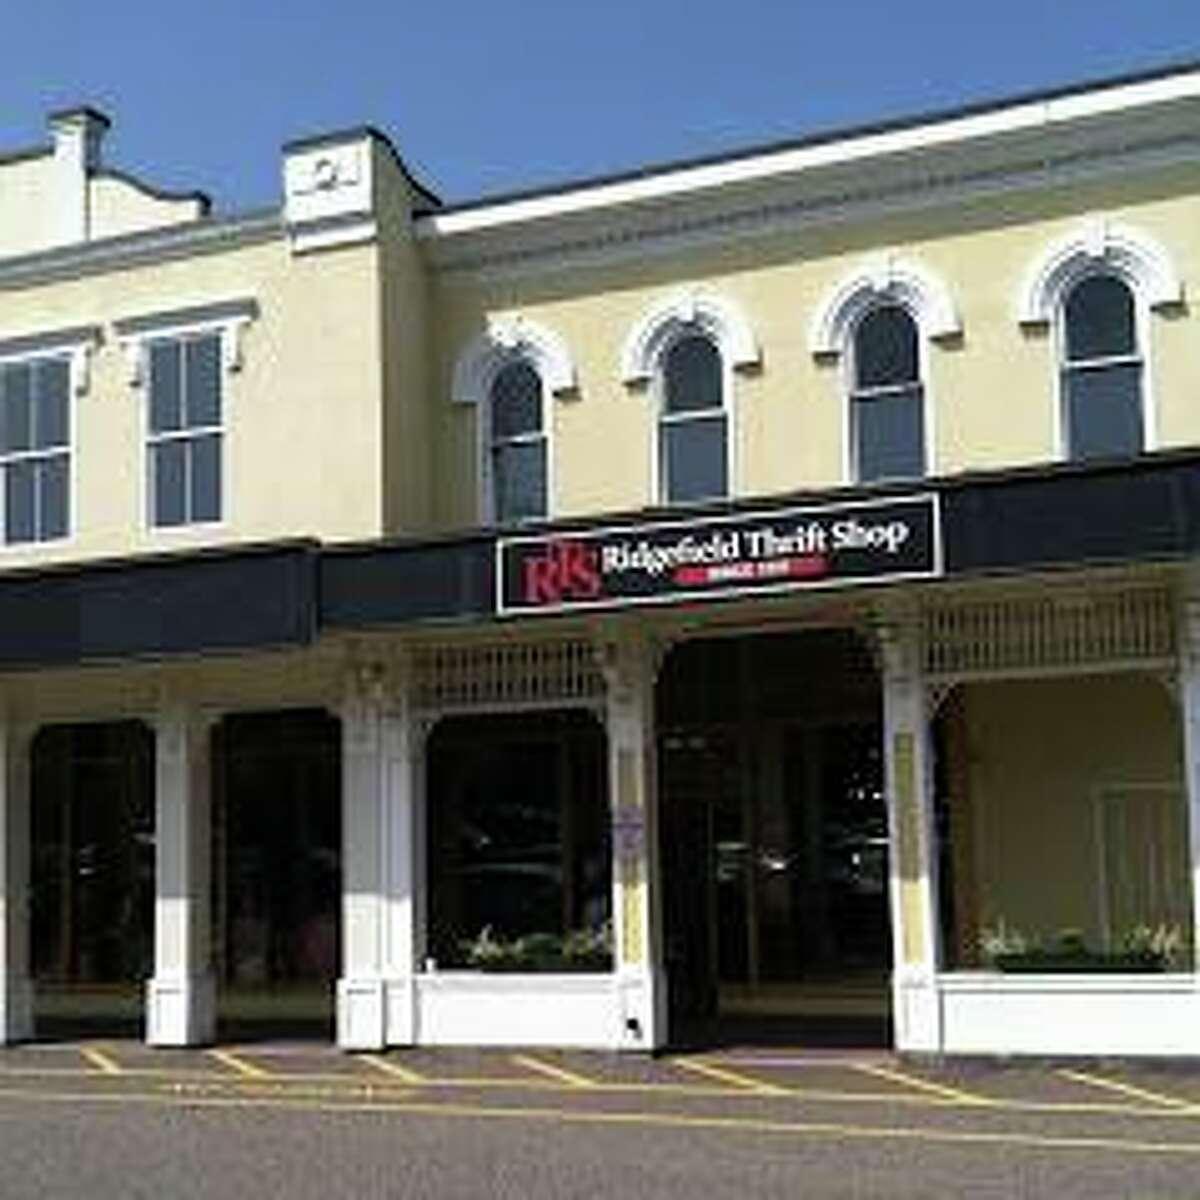 The Ridgefield Thrift Shop